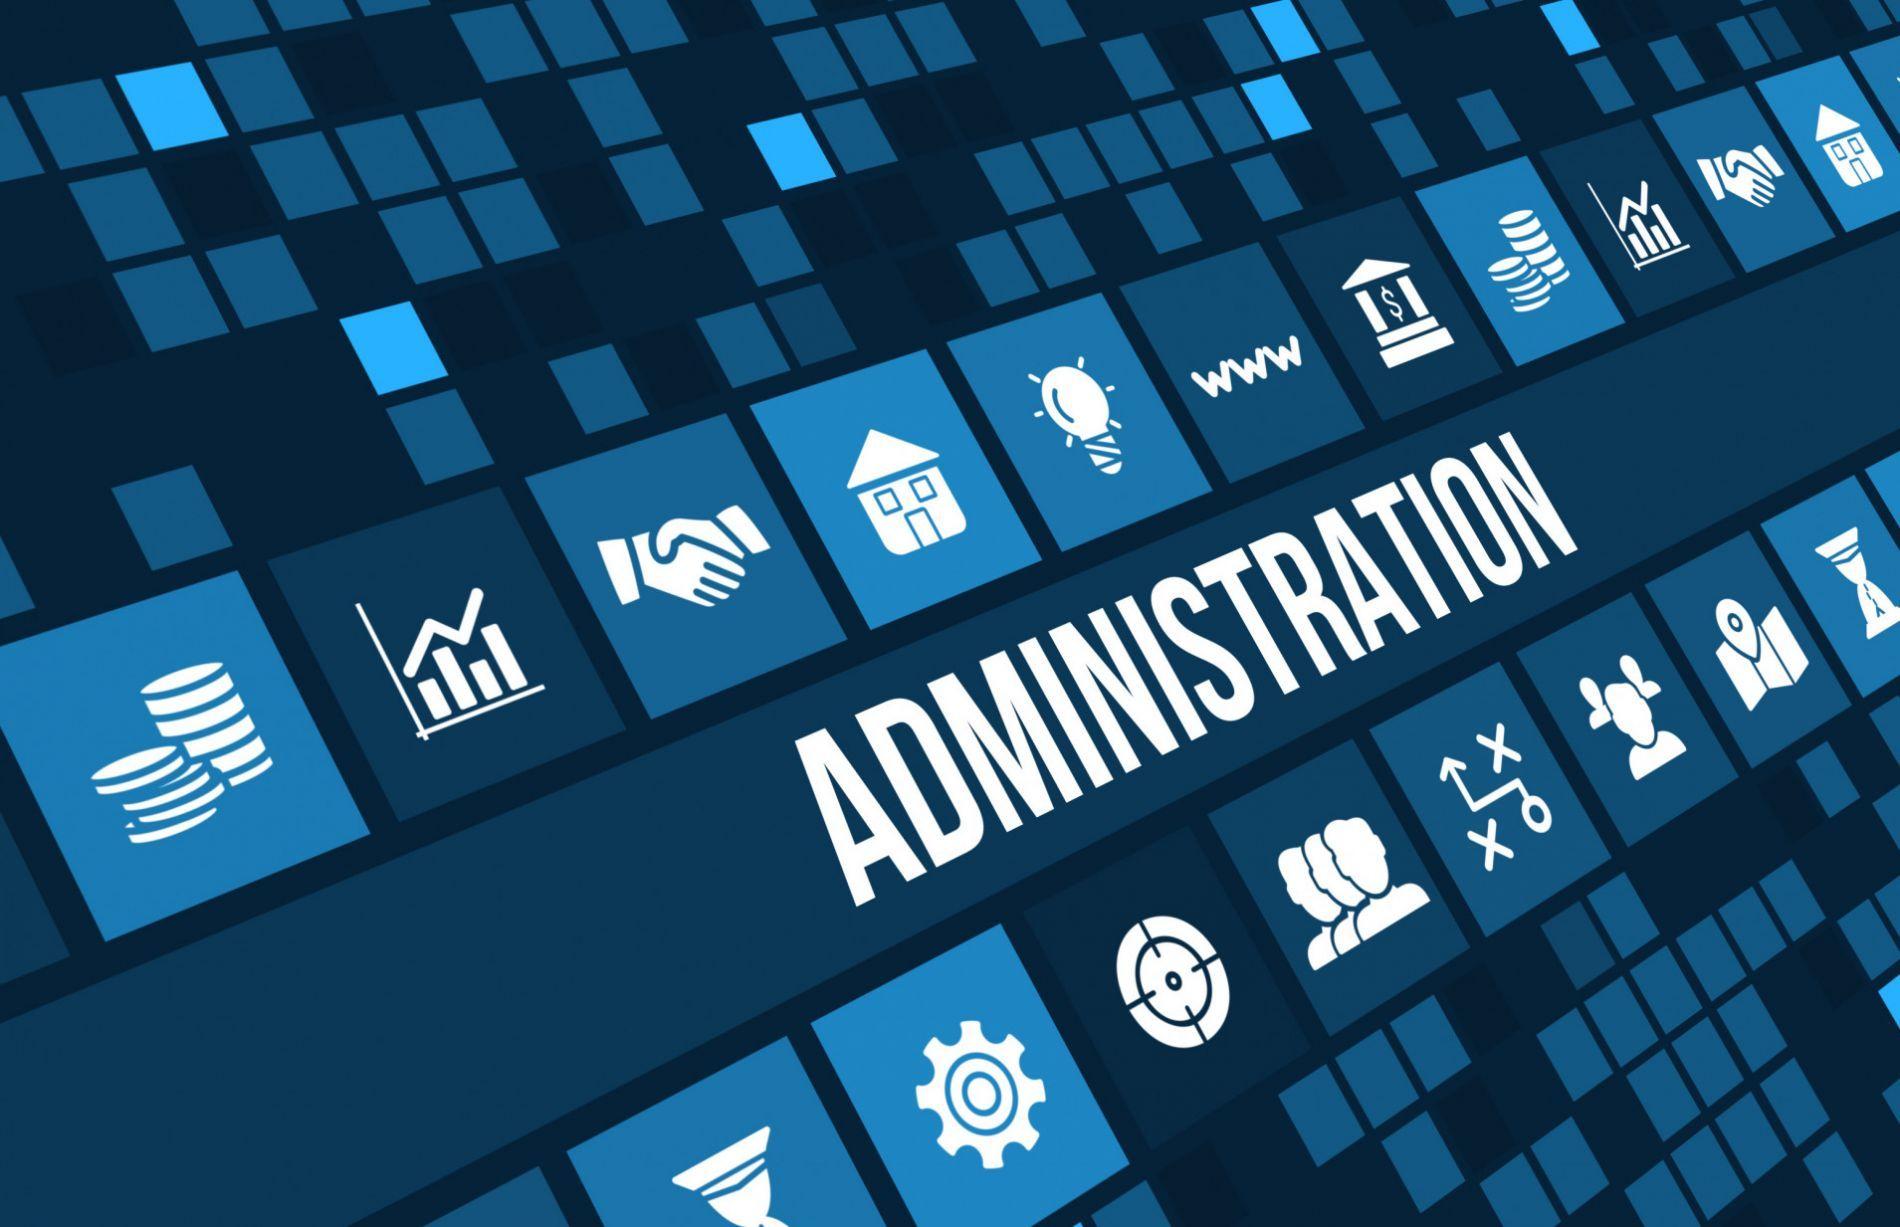 Administratief medewerker (Copyright)